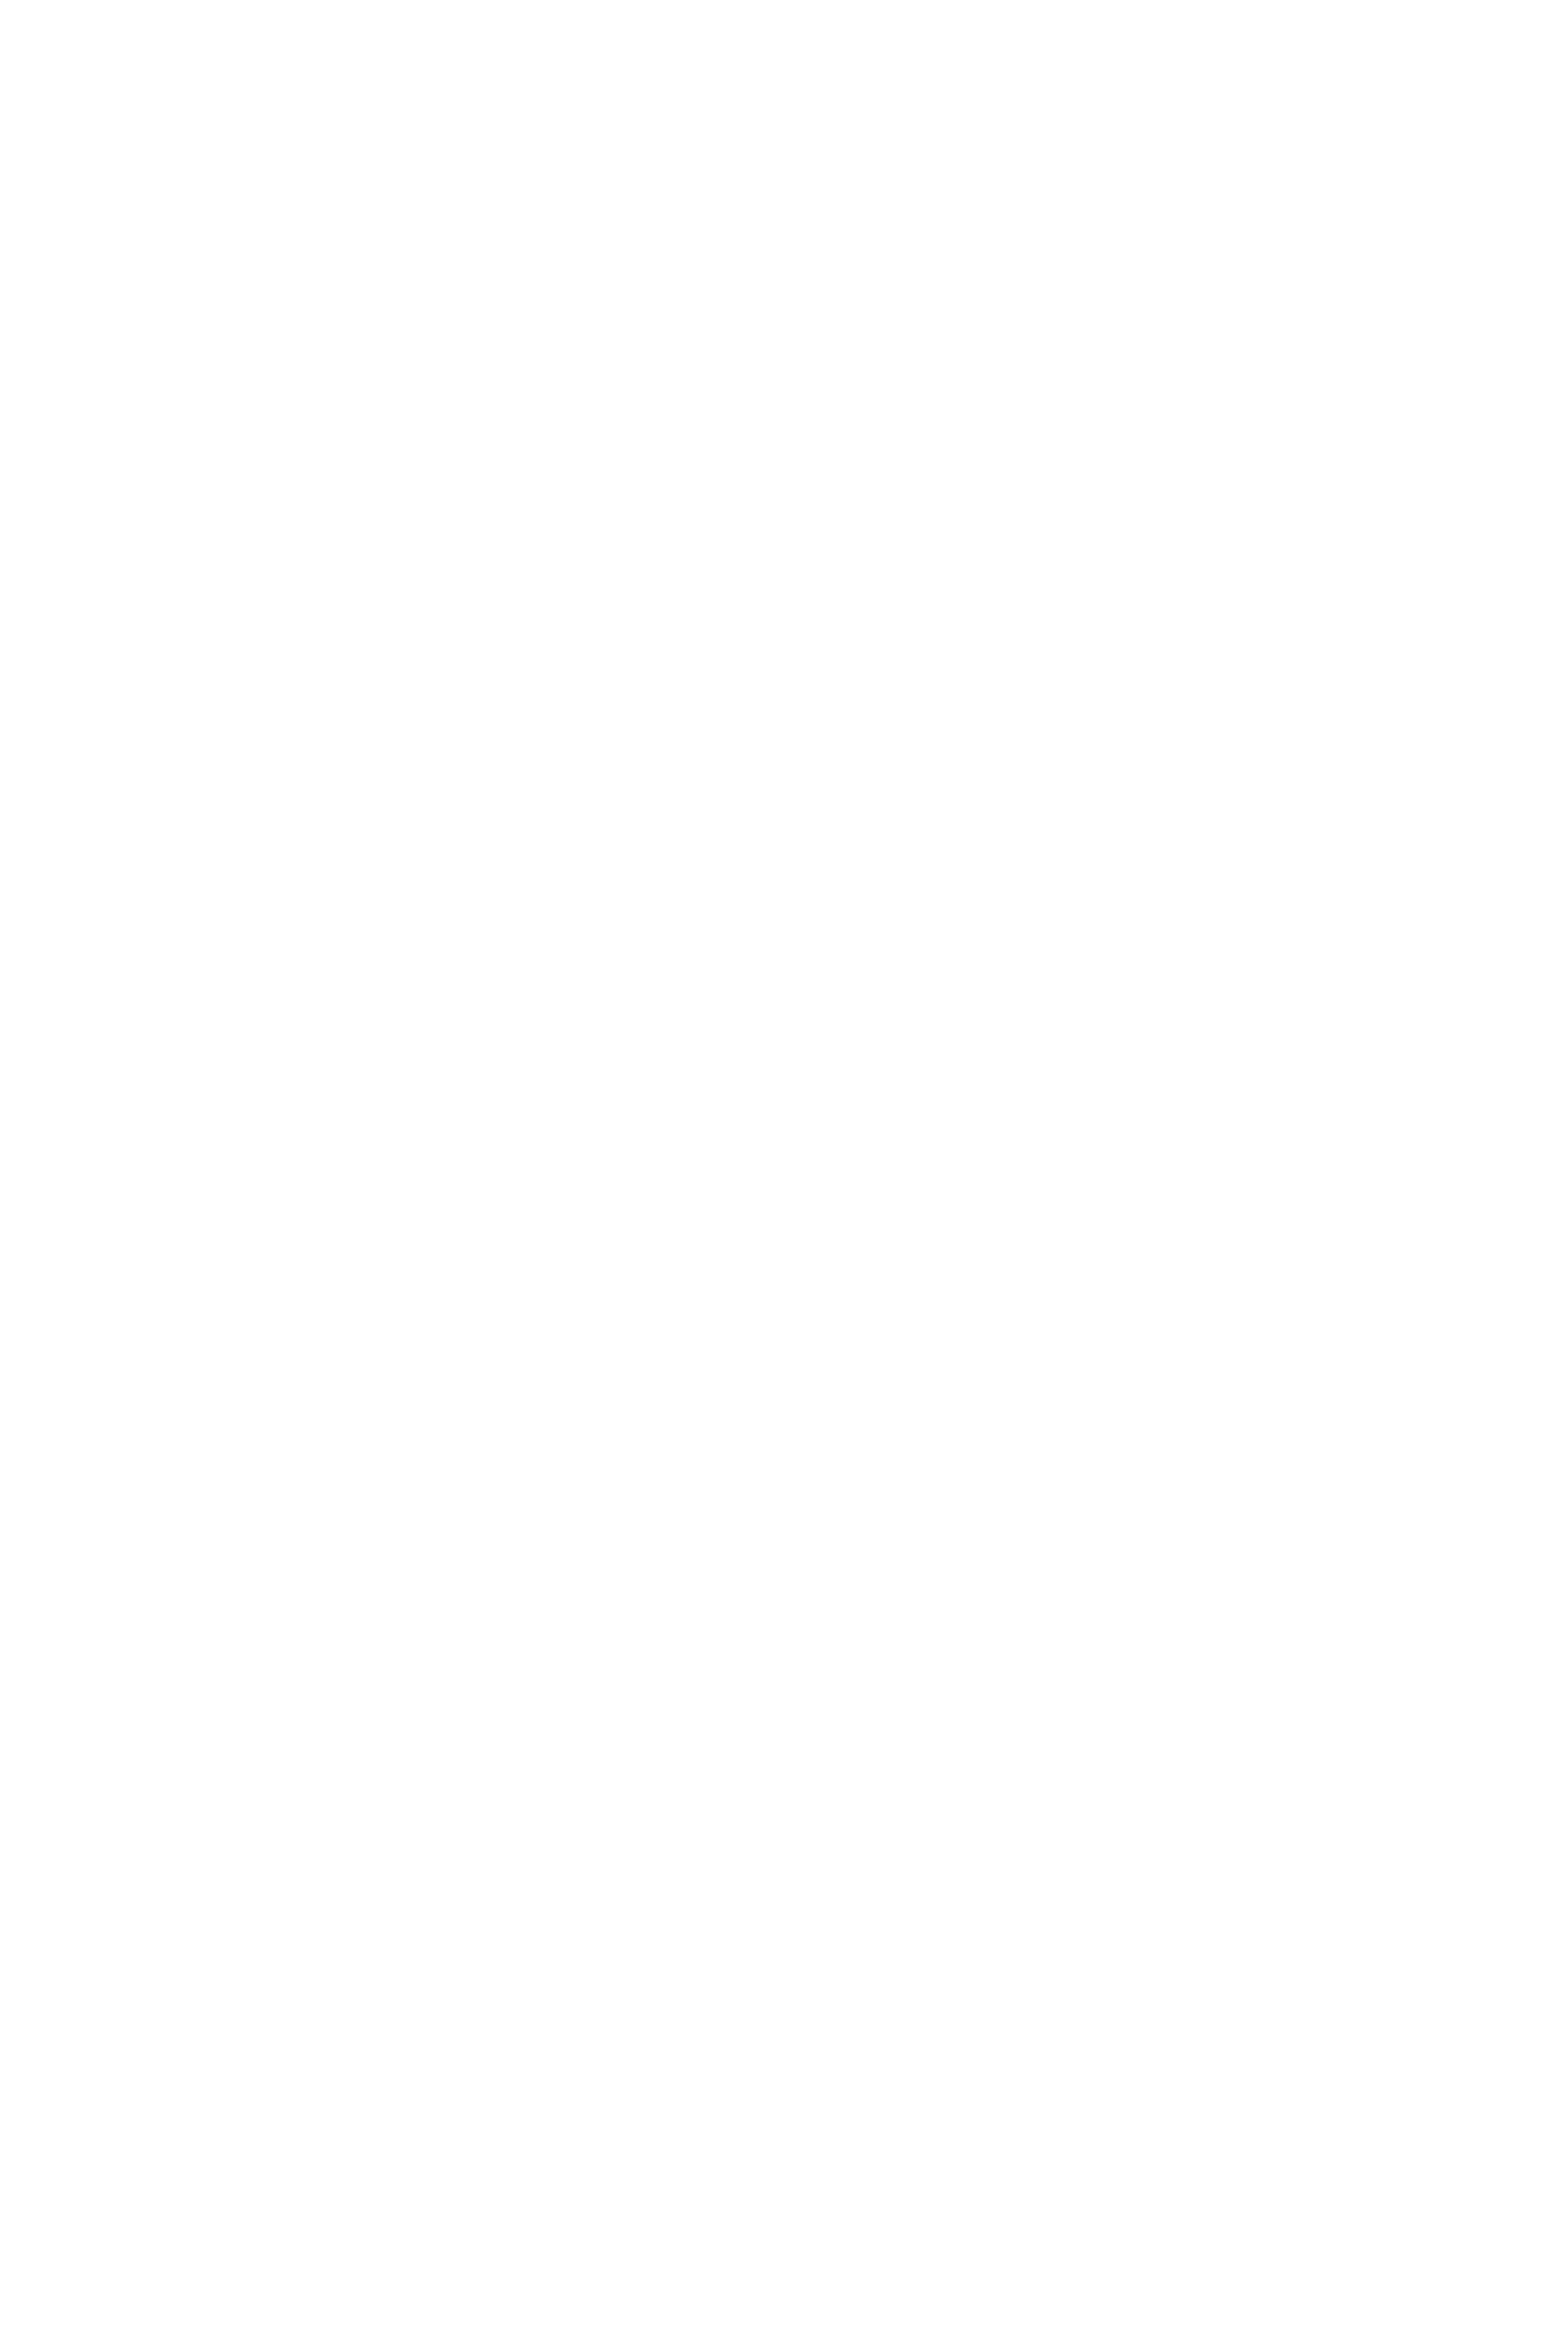 Cabo USB Lightning Metálico compatível com iPhone/iPad/iPod